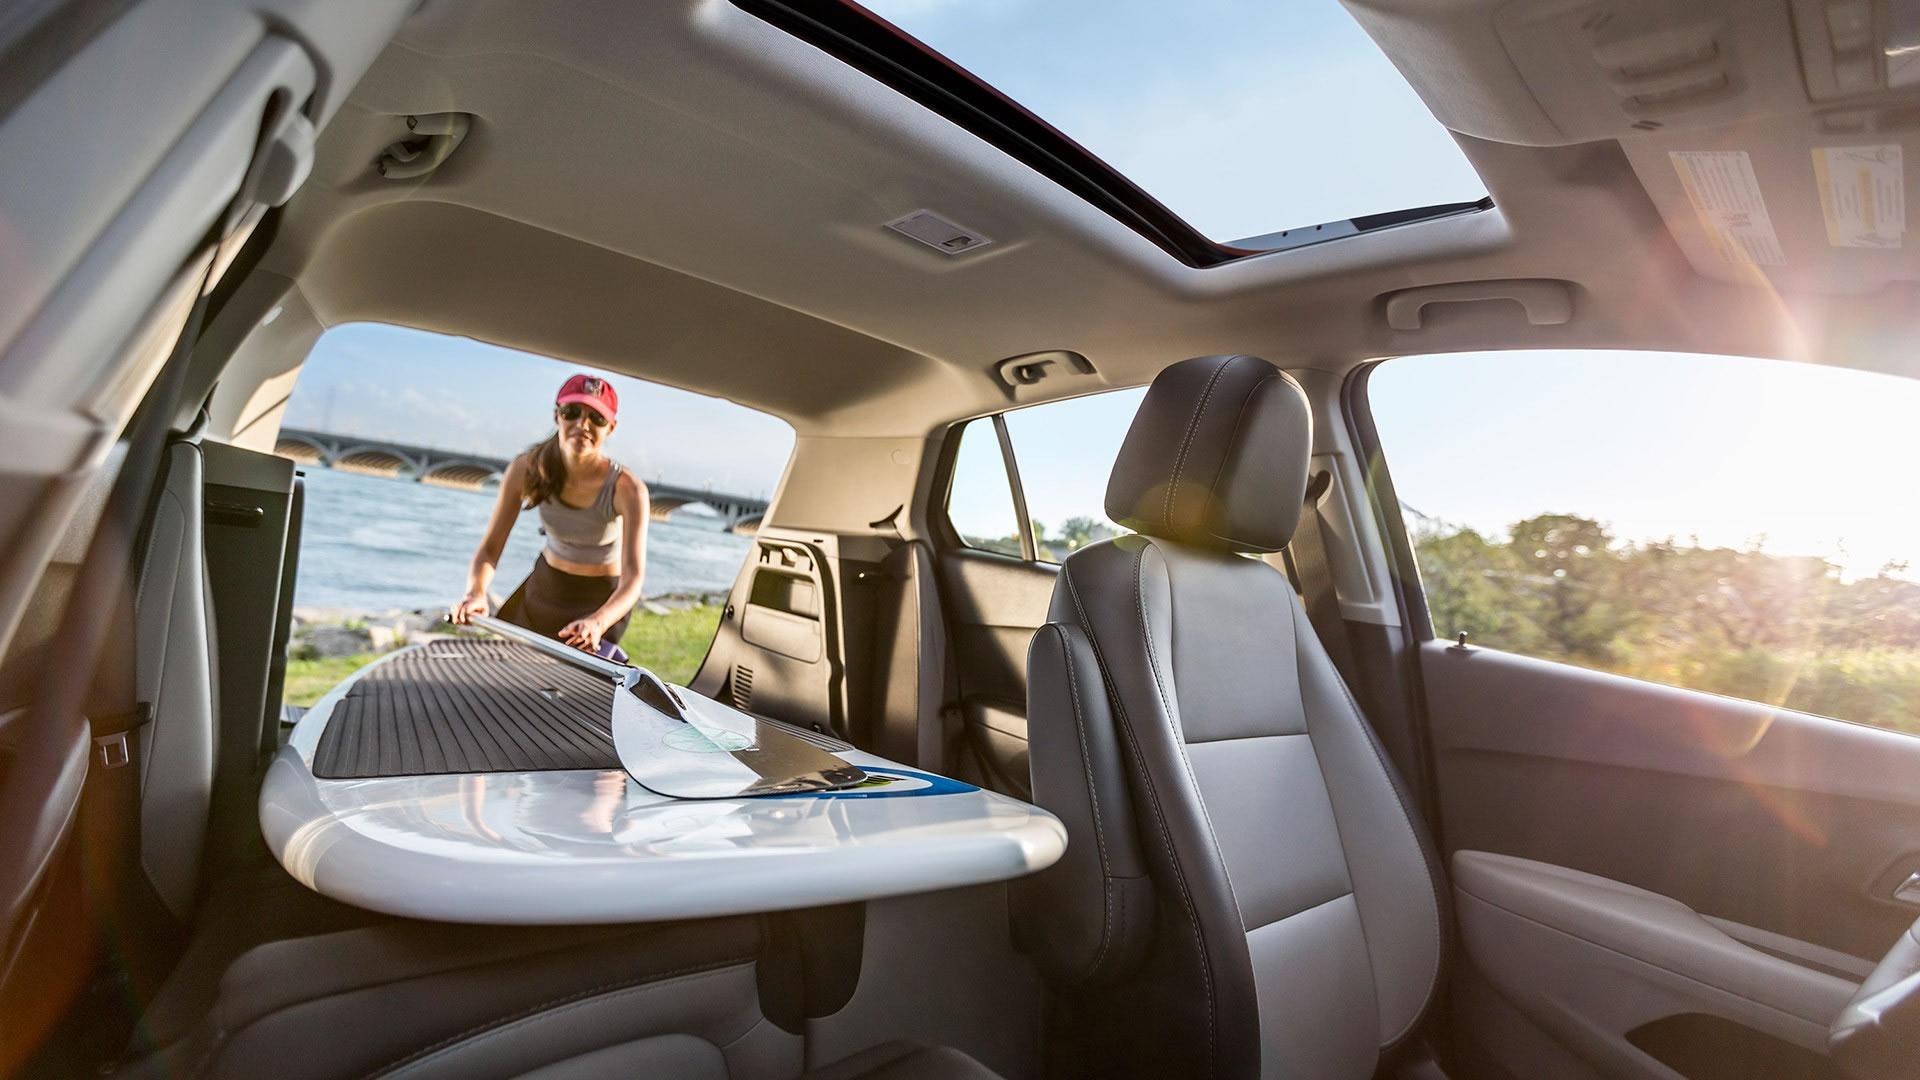 2015 Chevy Trax Interior